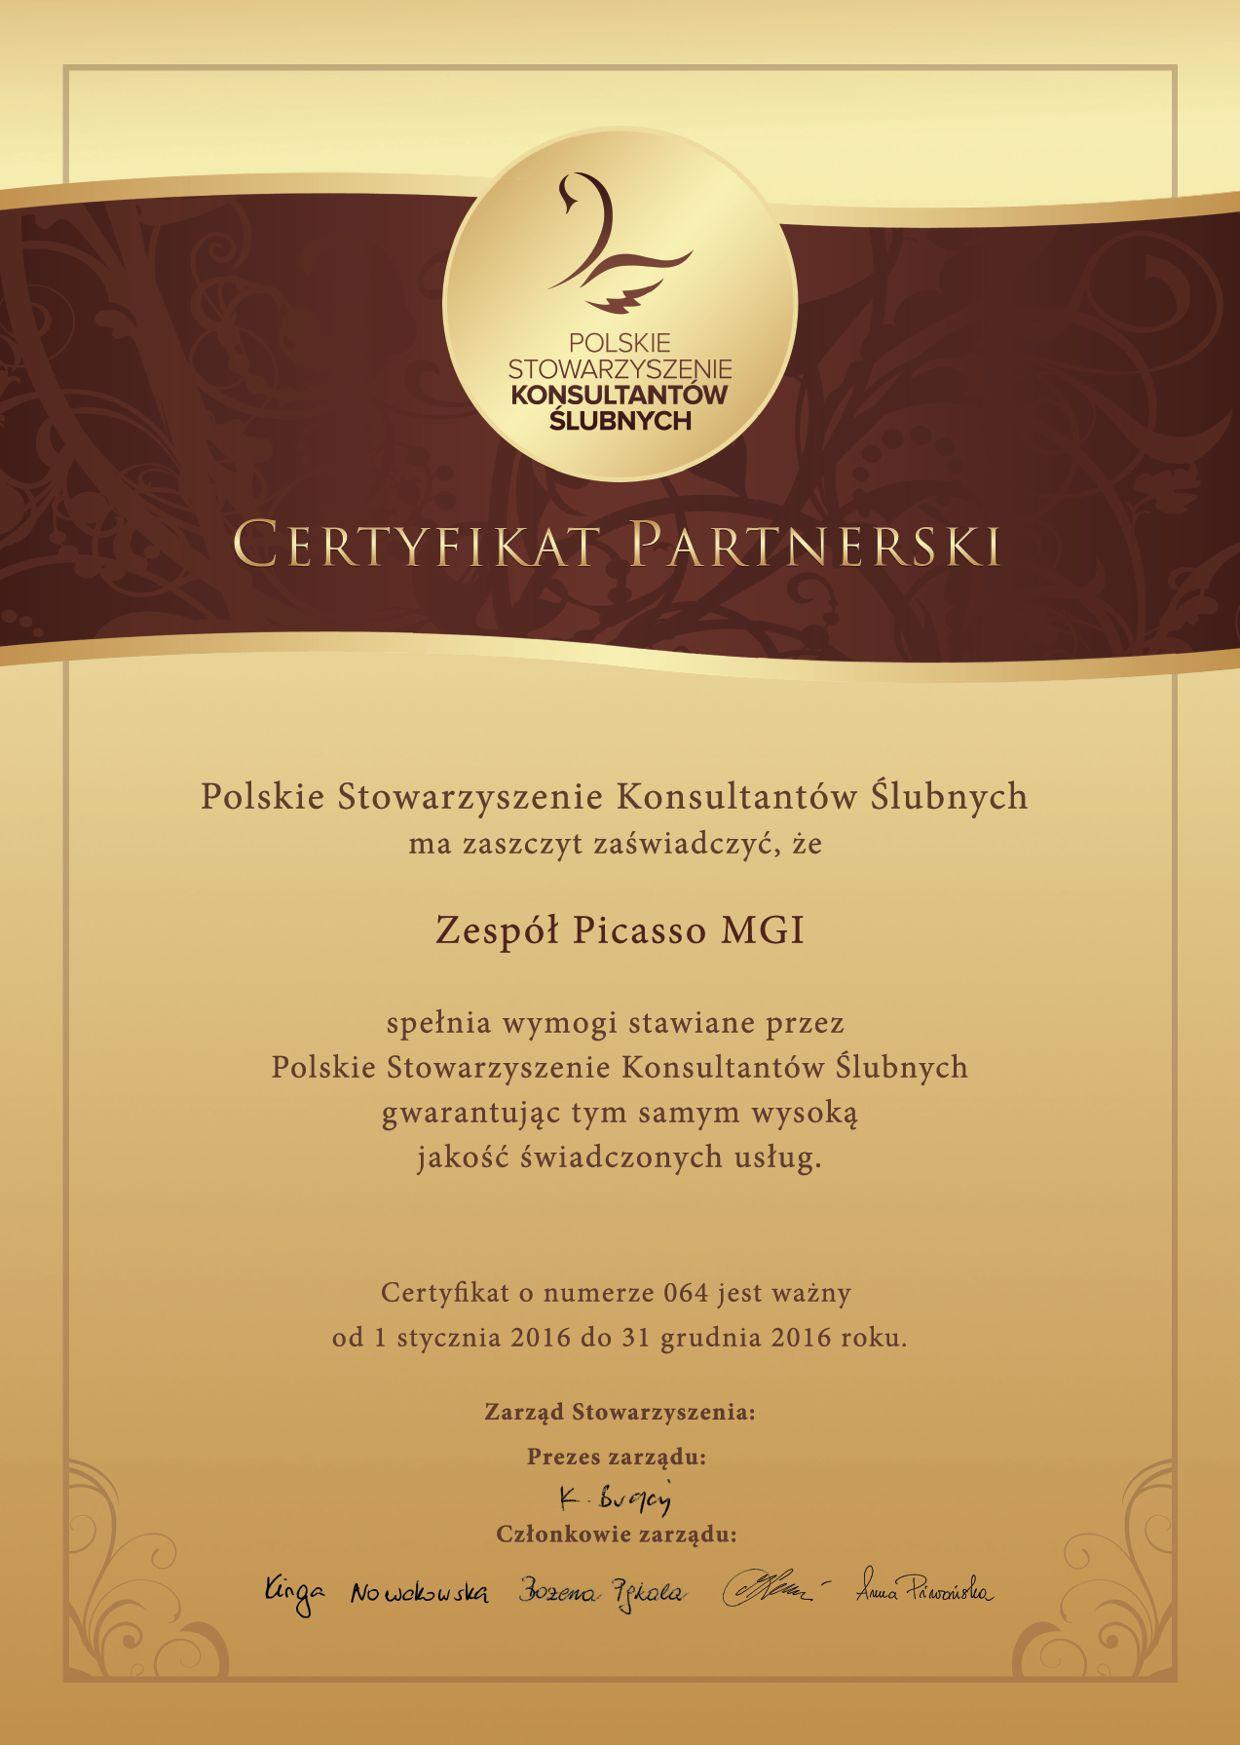 Certyfikat partnerski